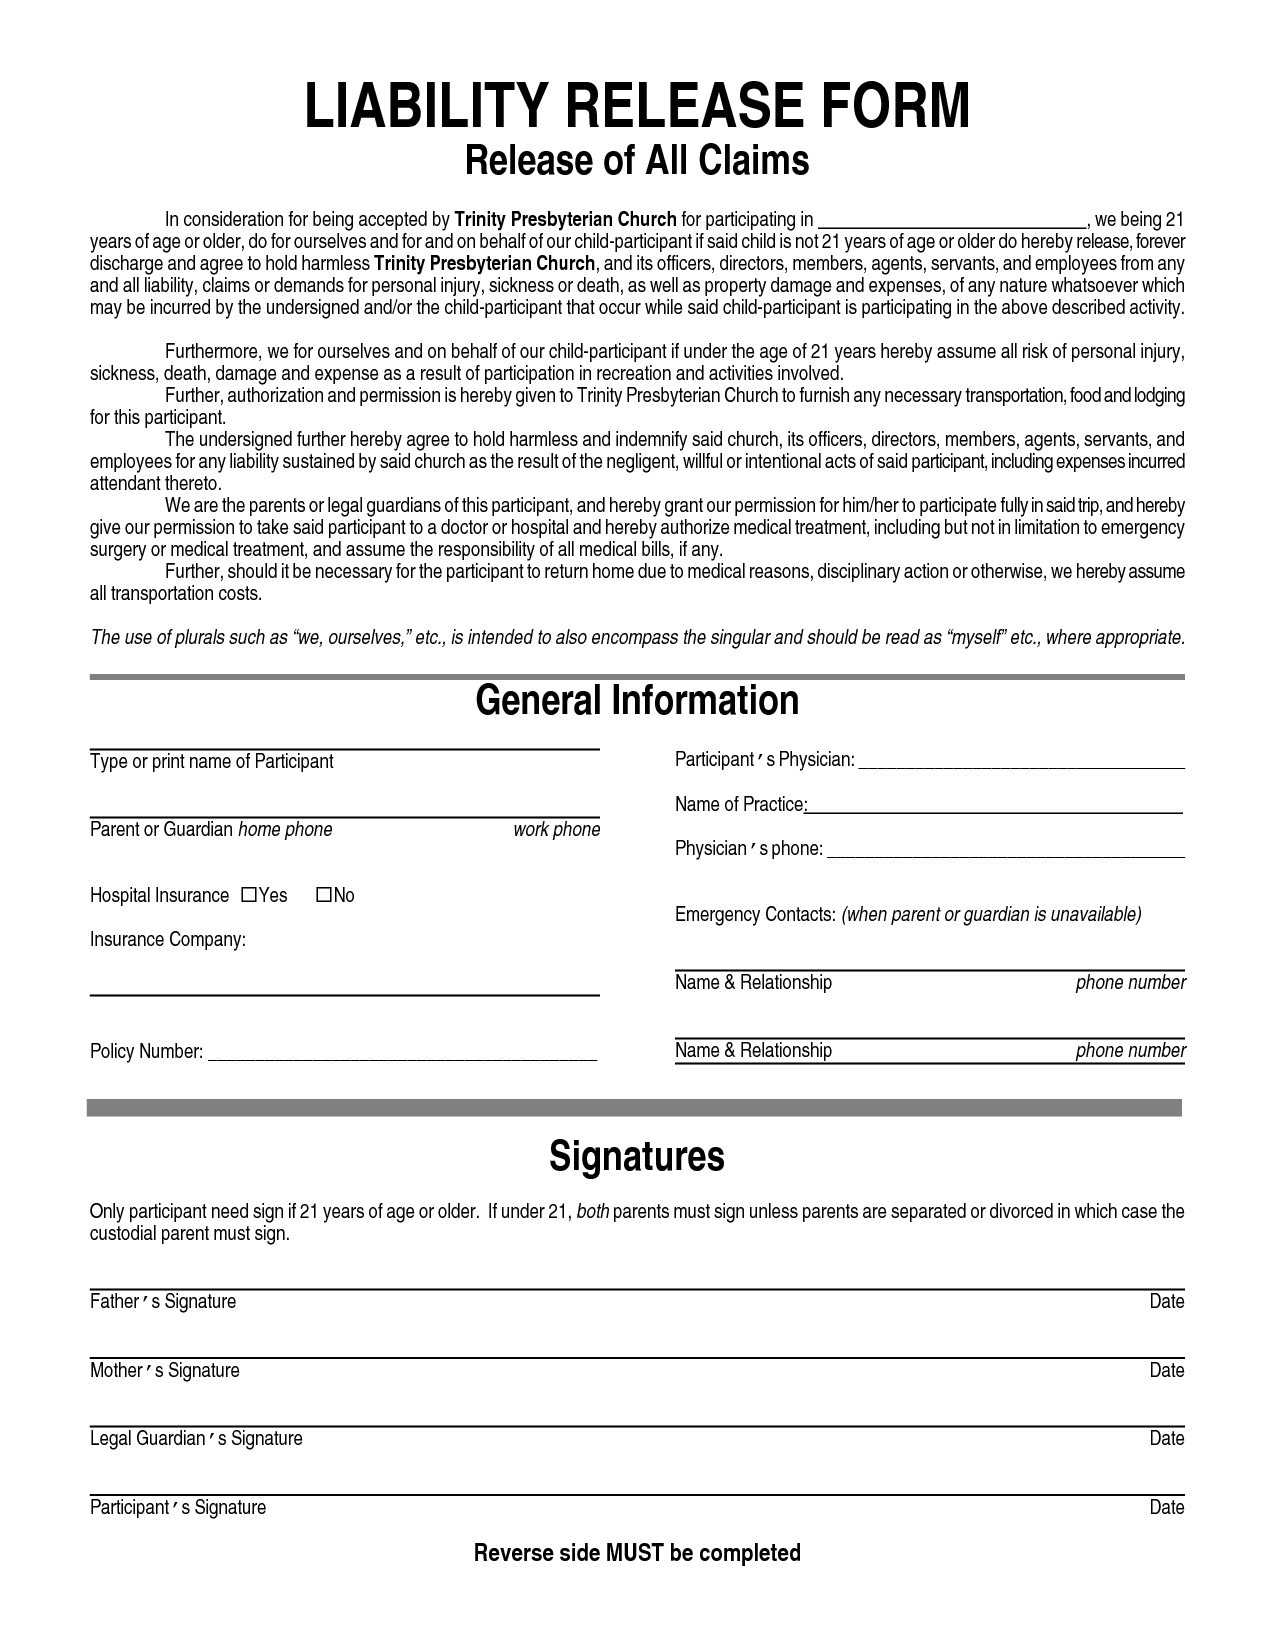 Printable Sample Liability Form Form | Free Legal Documents - Free Printable Legal Documents Forms